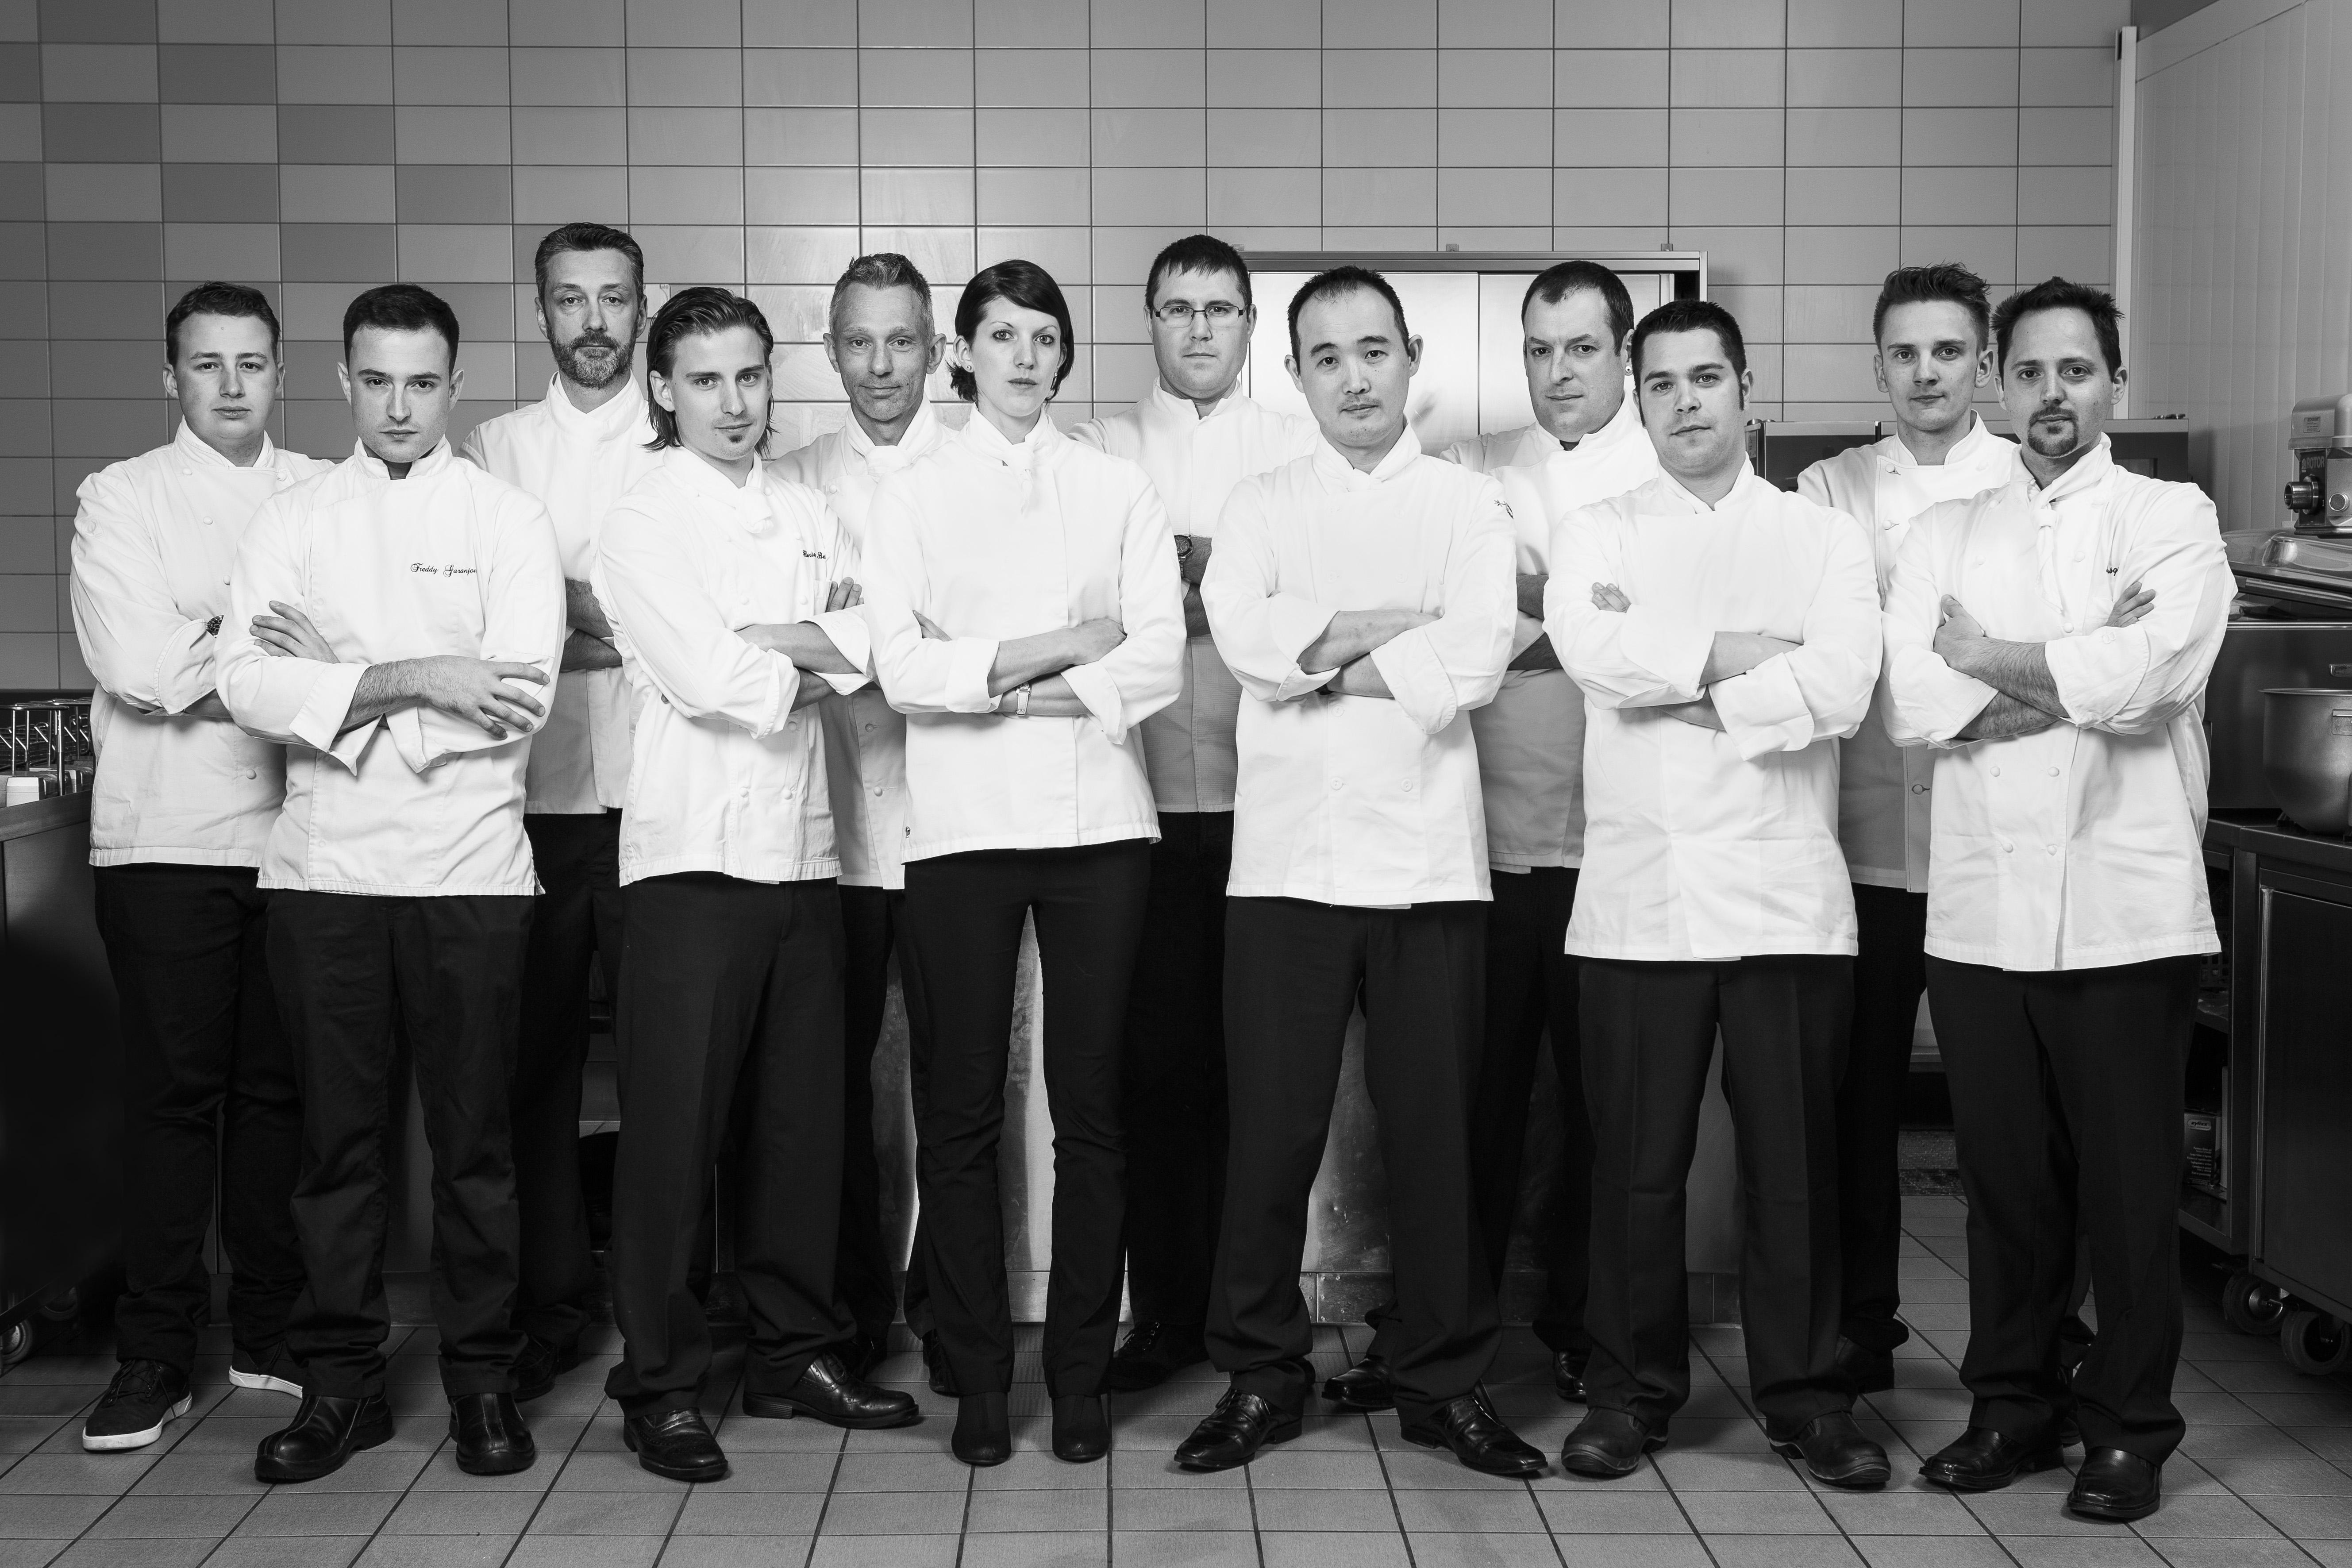 kochen kochtalente kochevent schweiz hotel restaurant